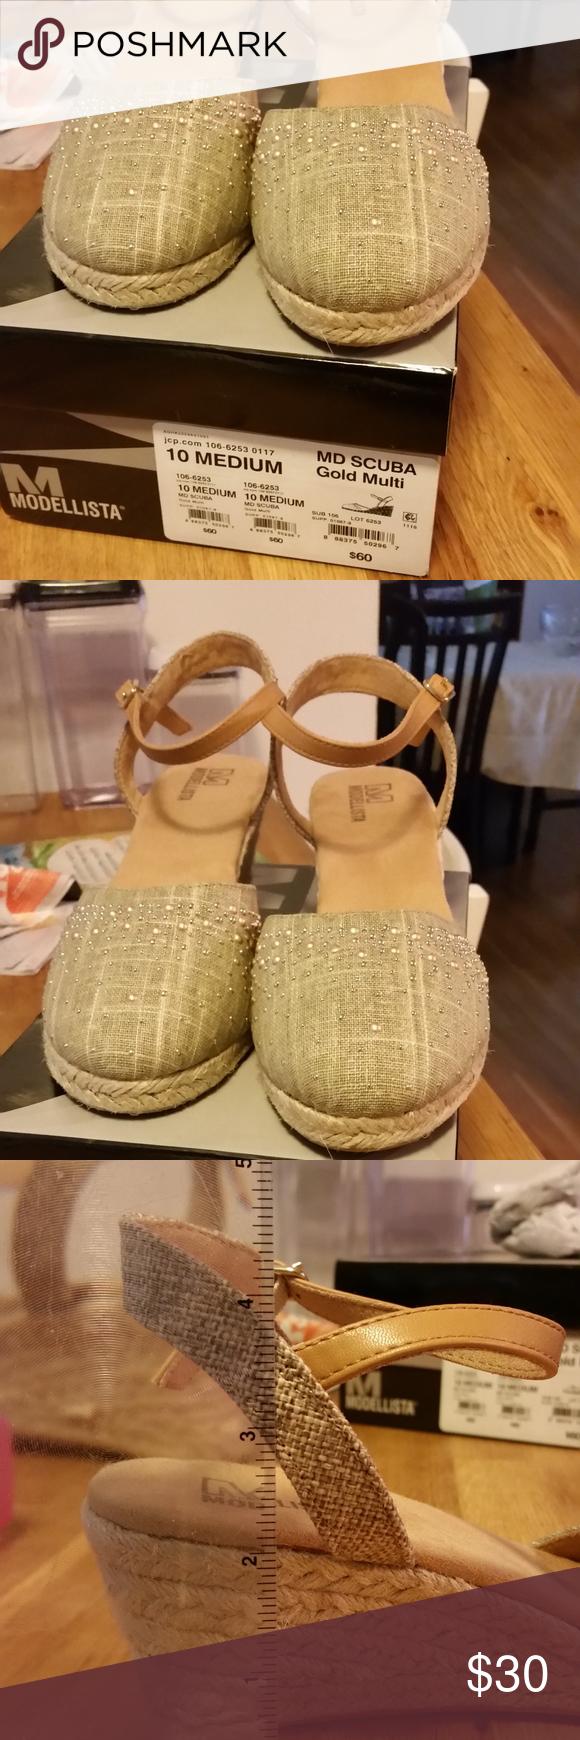 97b2efa0c24f Modellista Womens 10M NIB Gold wedge Modellista Womens 10 Medium MD Scuba  Gold Multi New In box - never worn Wedge Canvas shoe with gold Modellista  Shoes ...